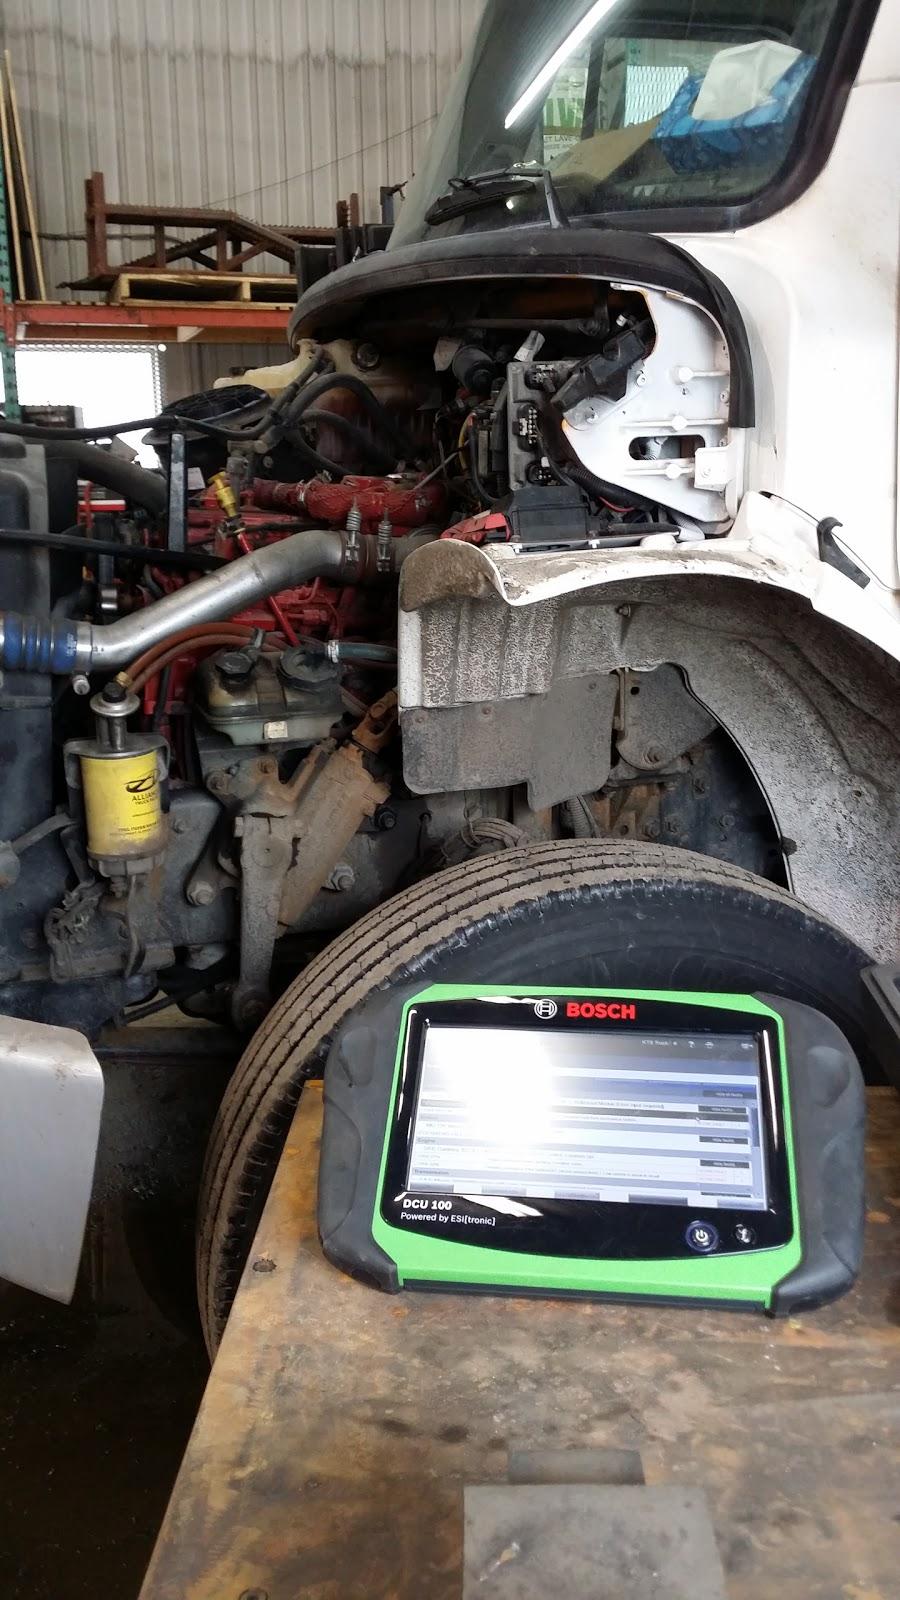 Mécanique Mobile LÉclair inc.   car repair   380 Rue Faraday, Québec, QC G1N 4E5, Canada   4185641616 OR +1 418-564-1616